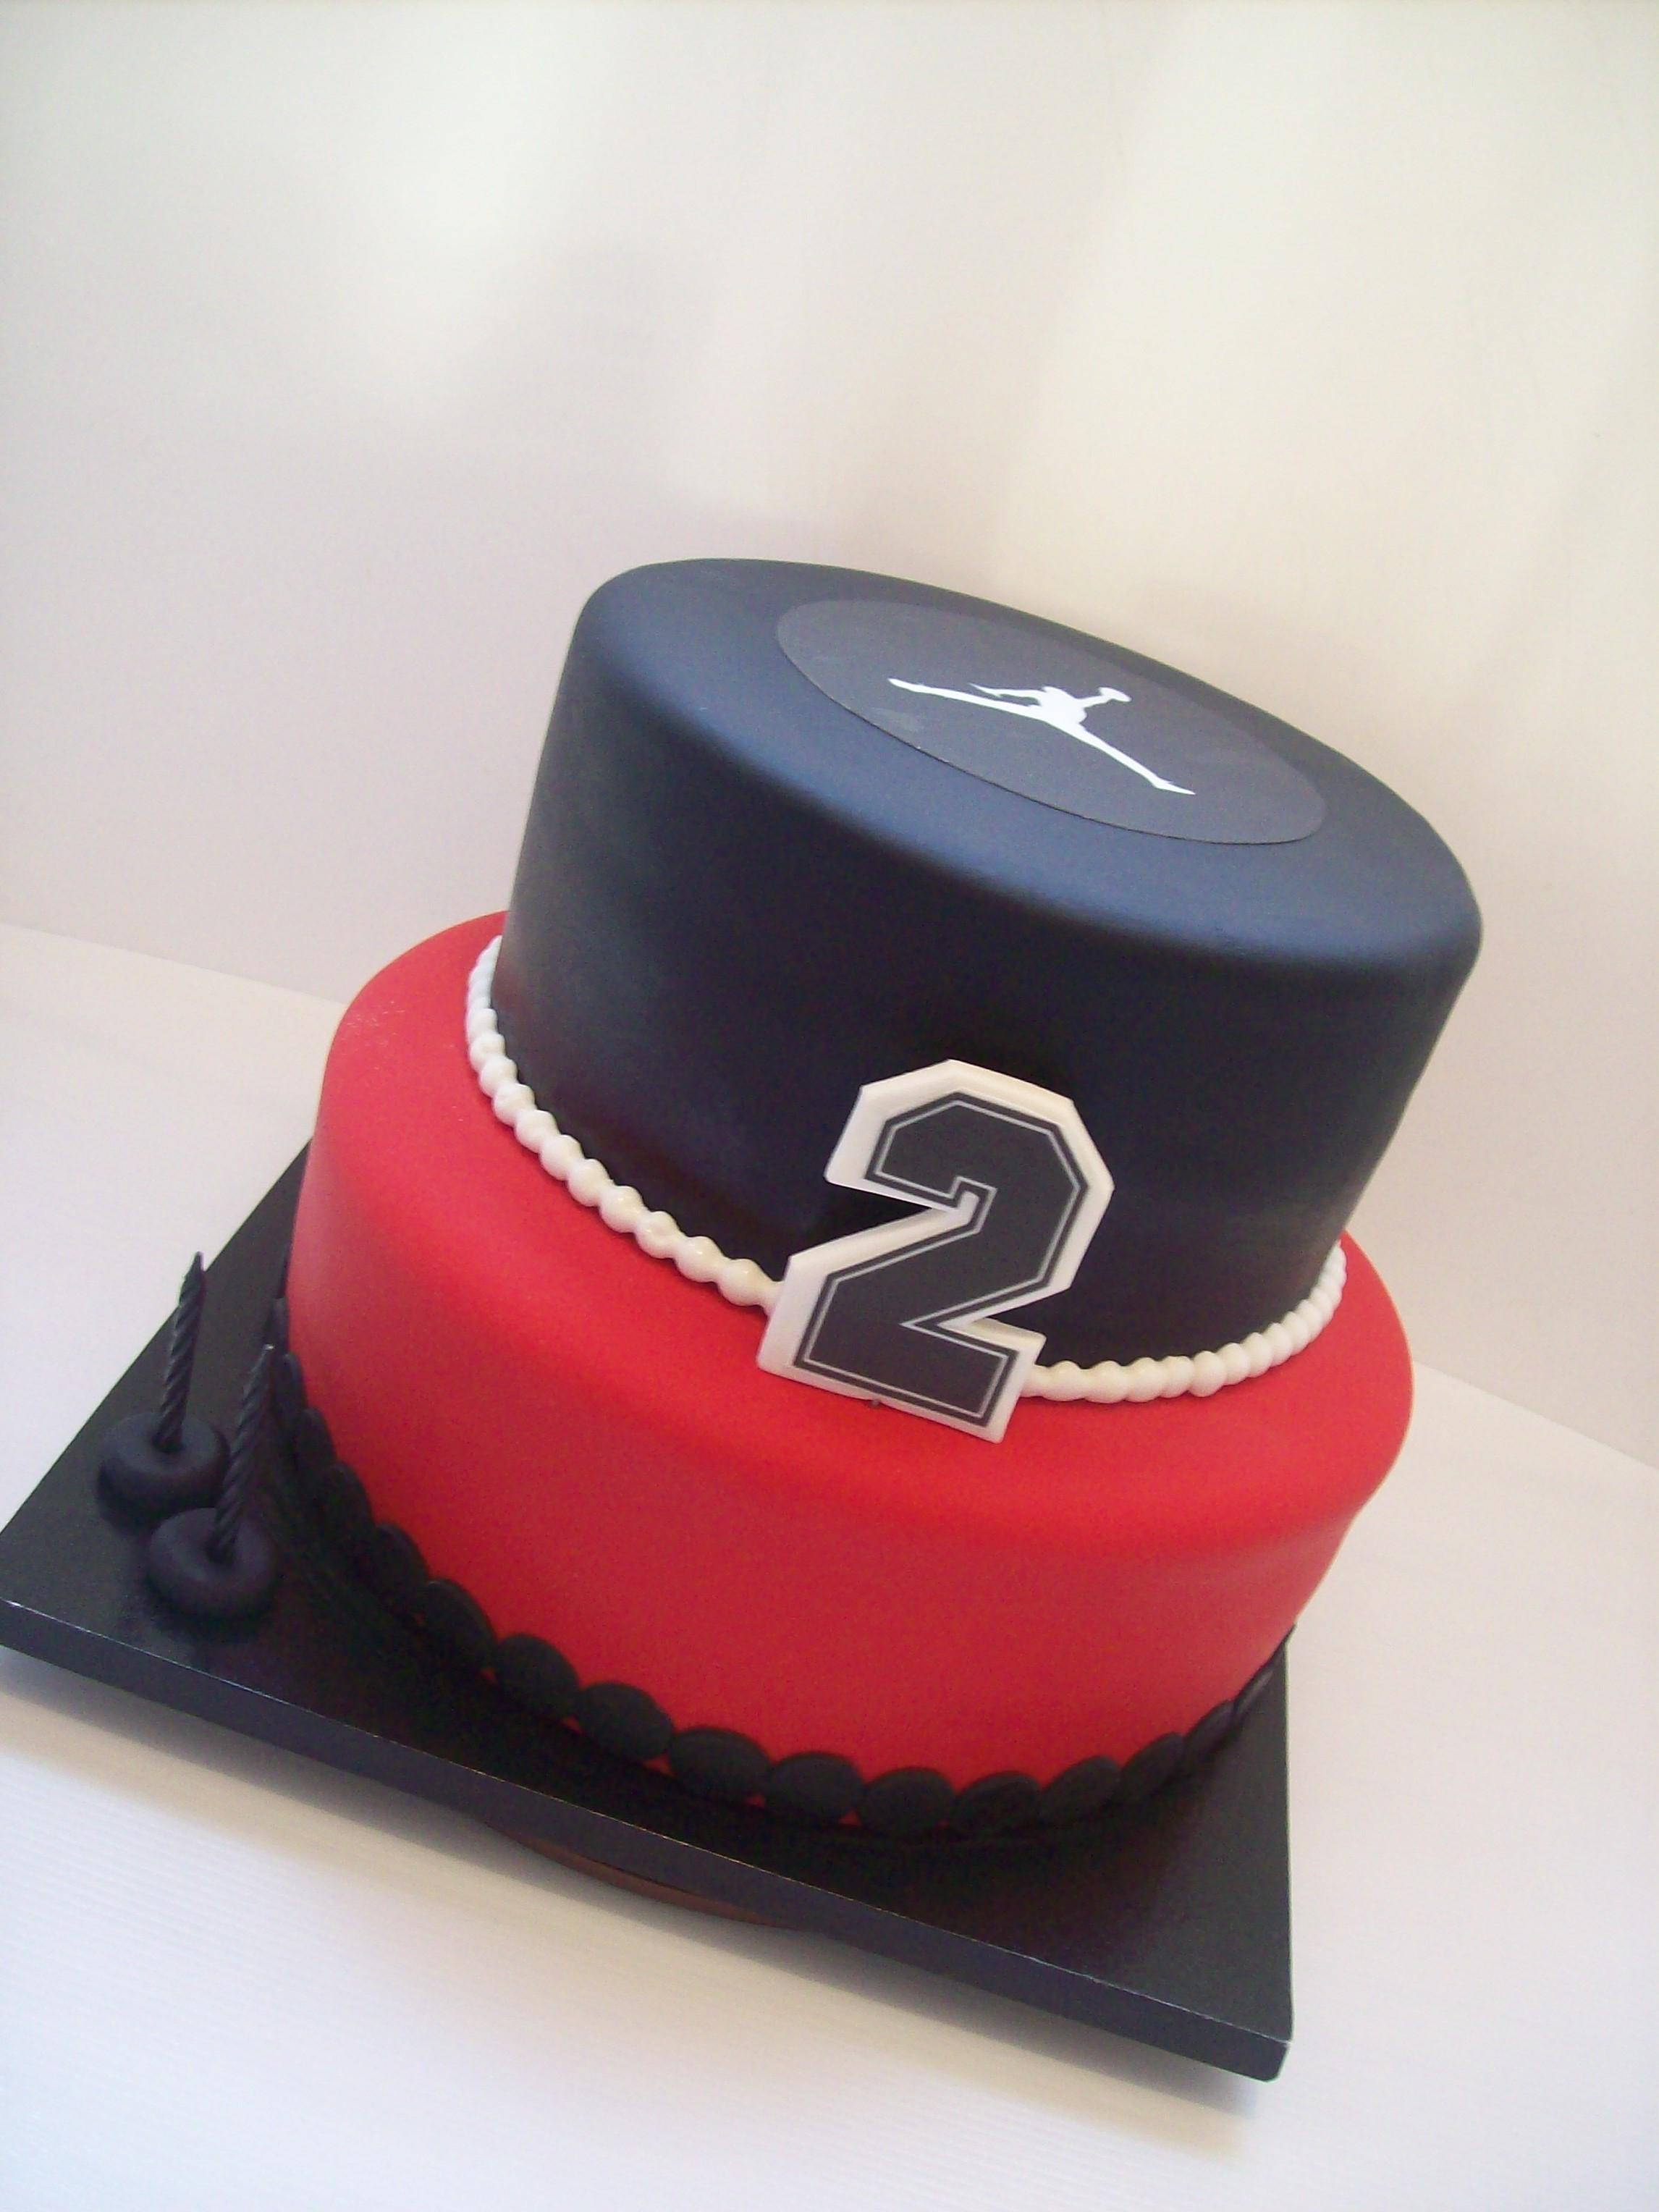 Michael Jordan Cake 349 Temptation Cakes Temptation Cakes